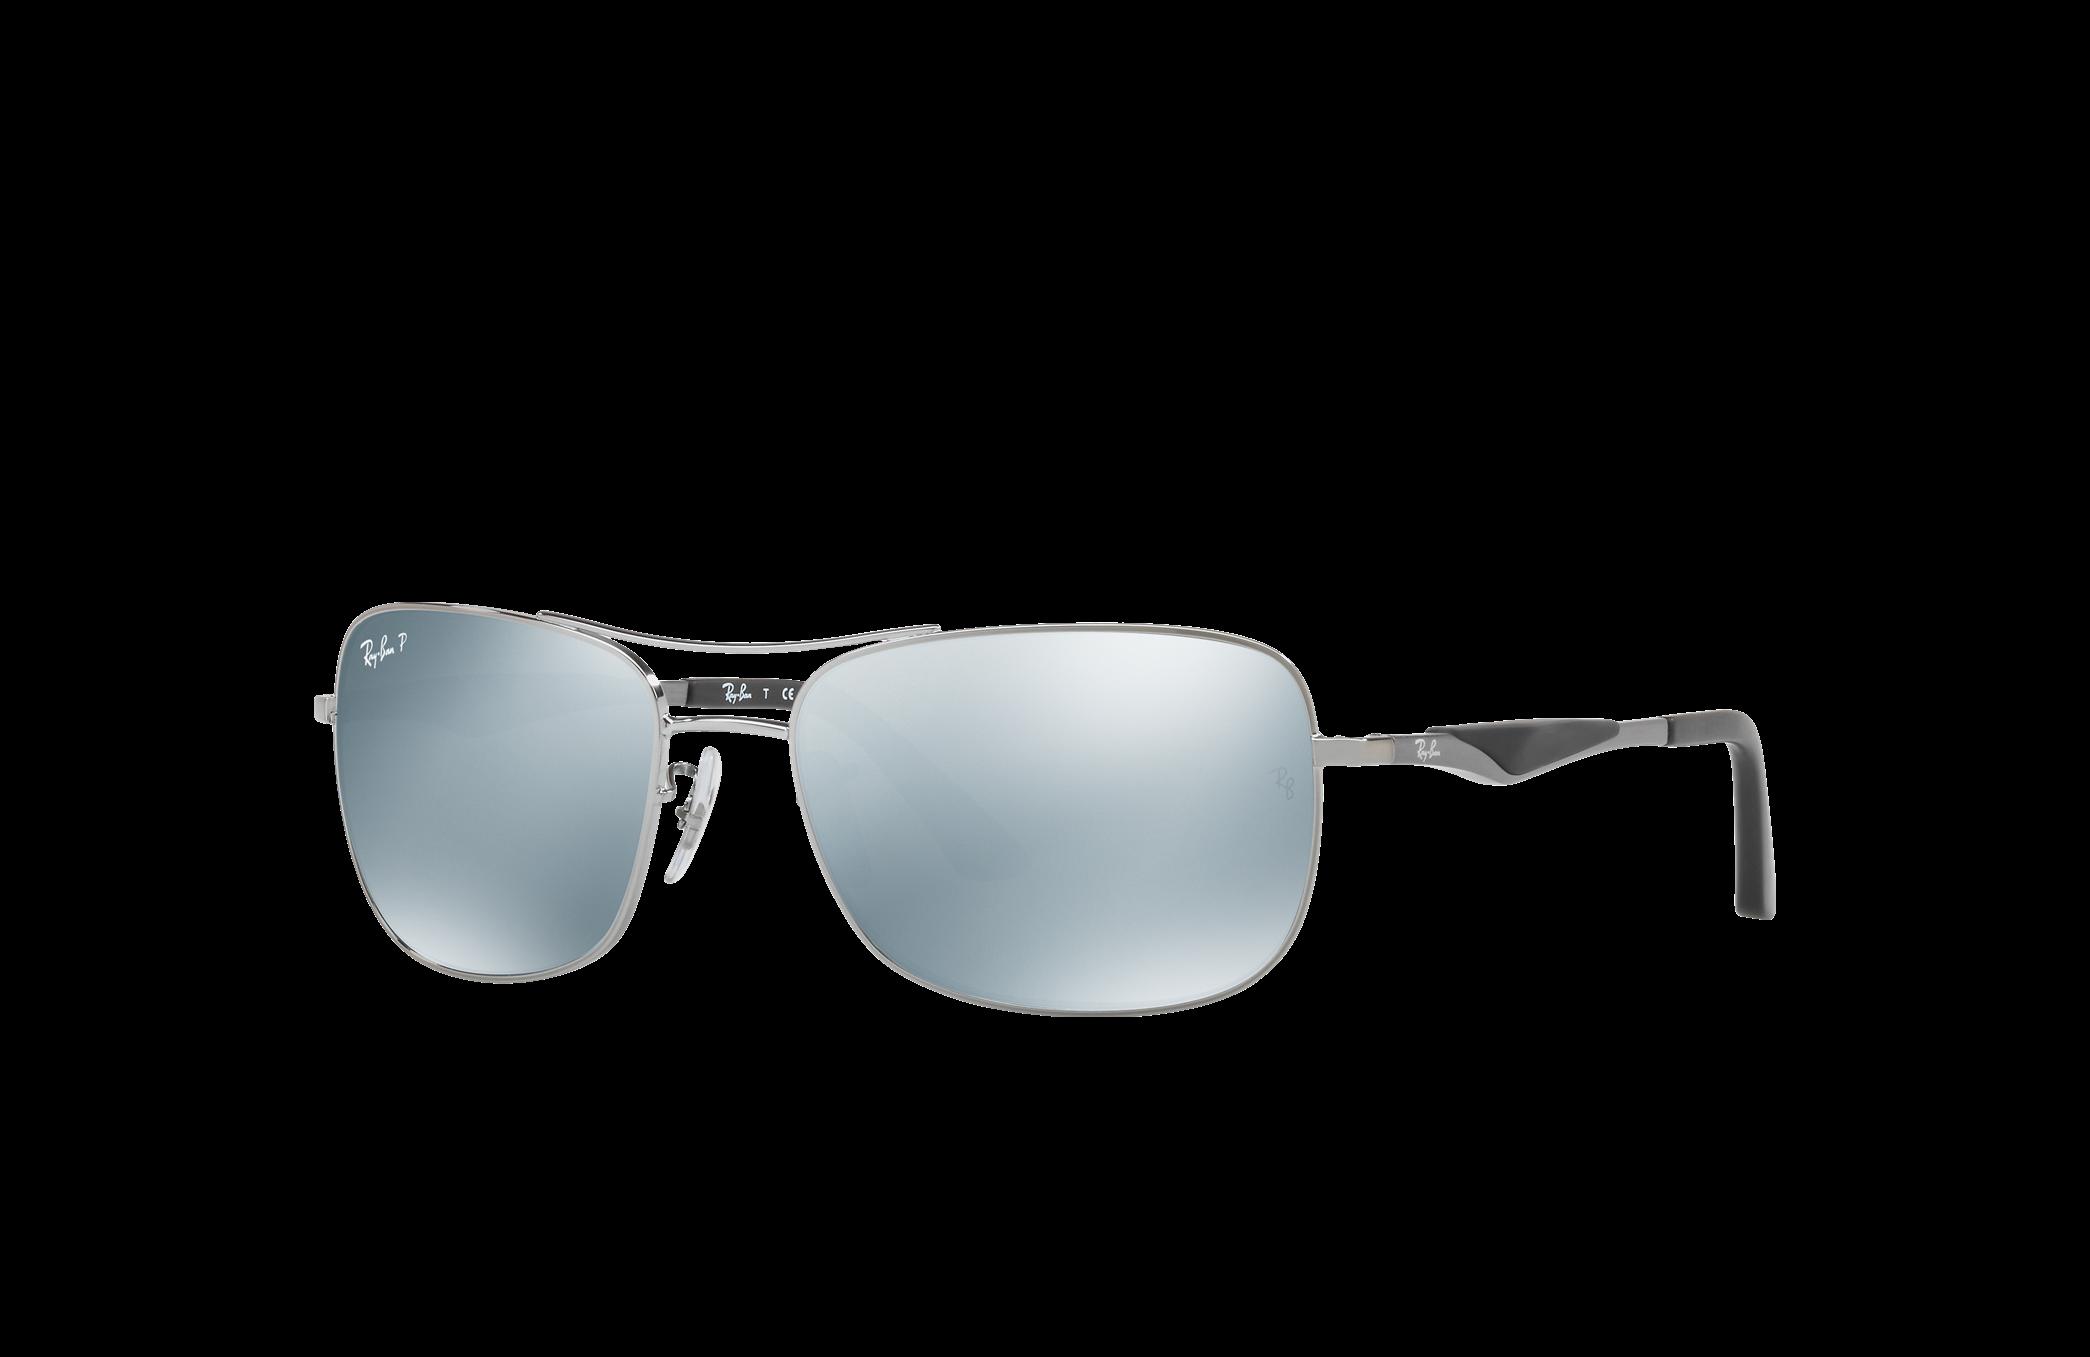 Ray-Ban Rb3515 Gunmetal, Polarized Gray Lenses - RB3515